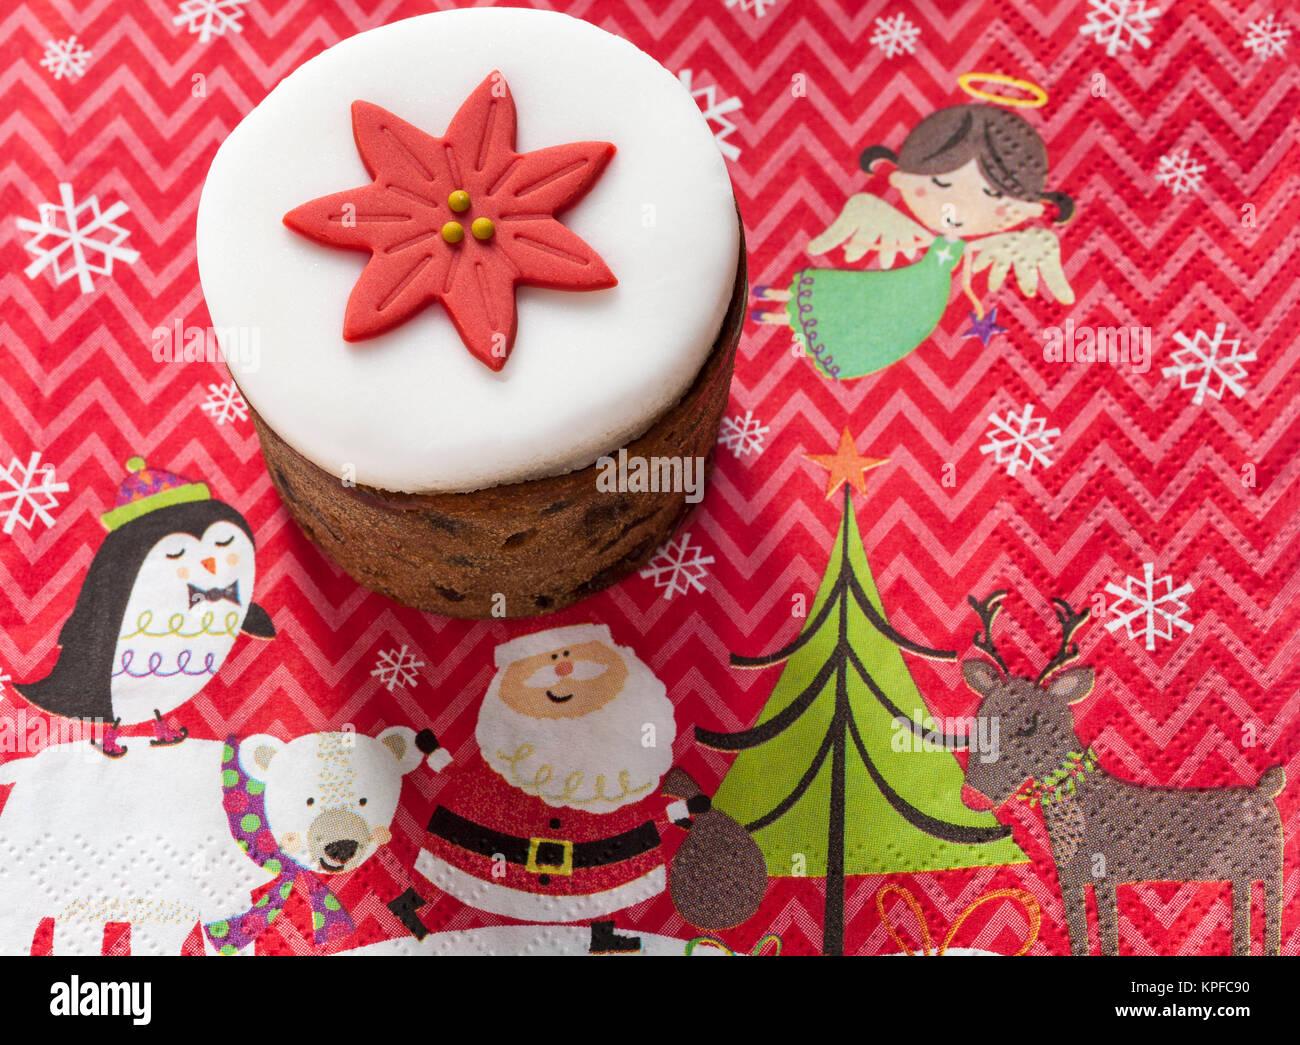 Tesco Mini Top Iced Christmas Cake Reiche Frucht Kuchen Mit Glace